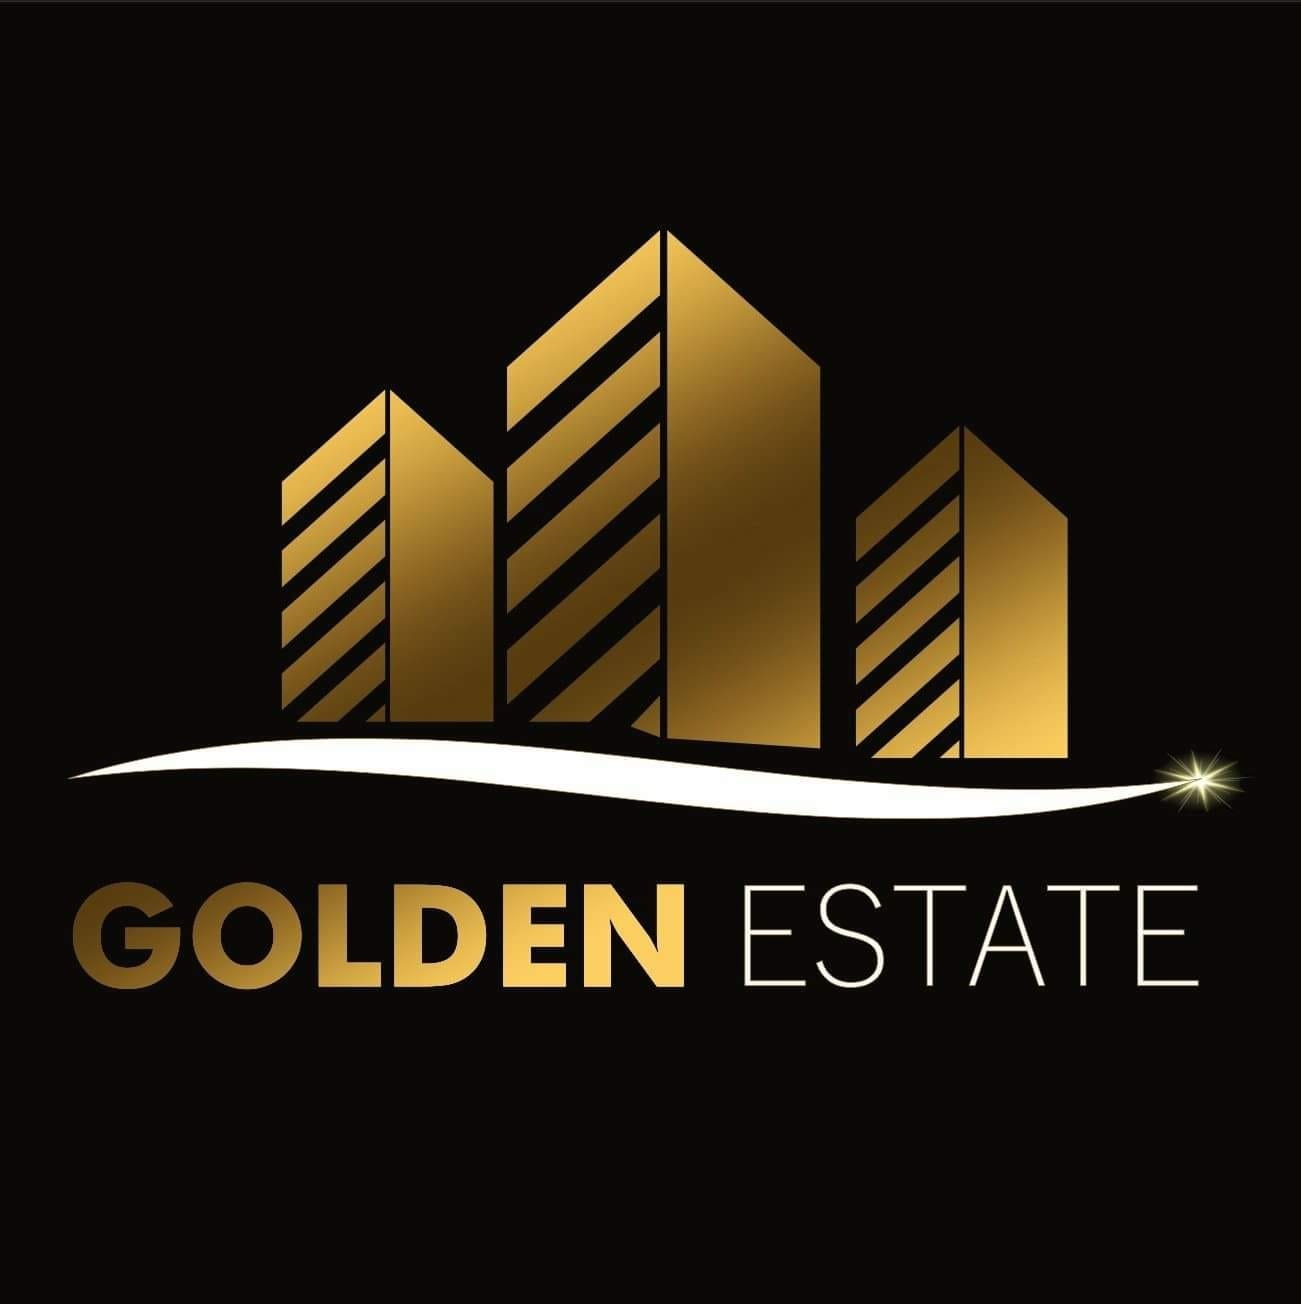 Golden Estate